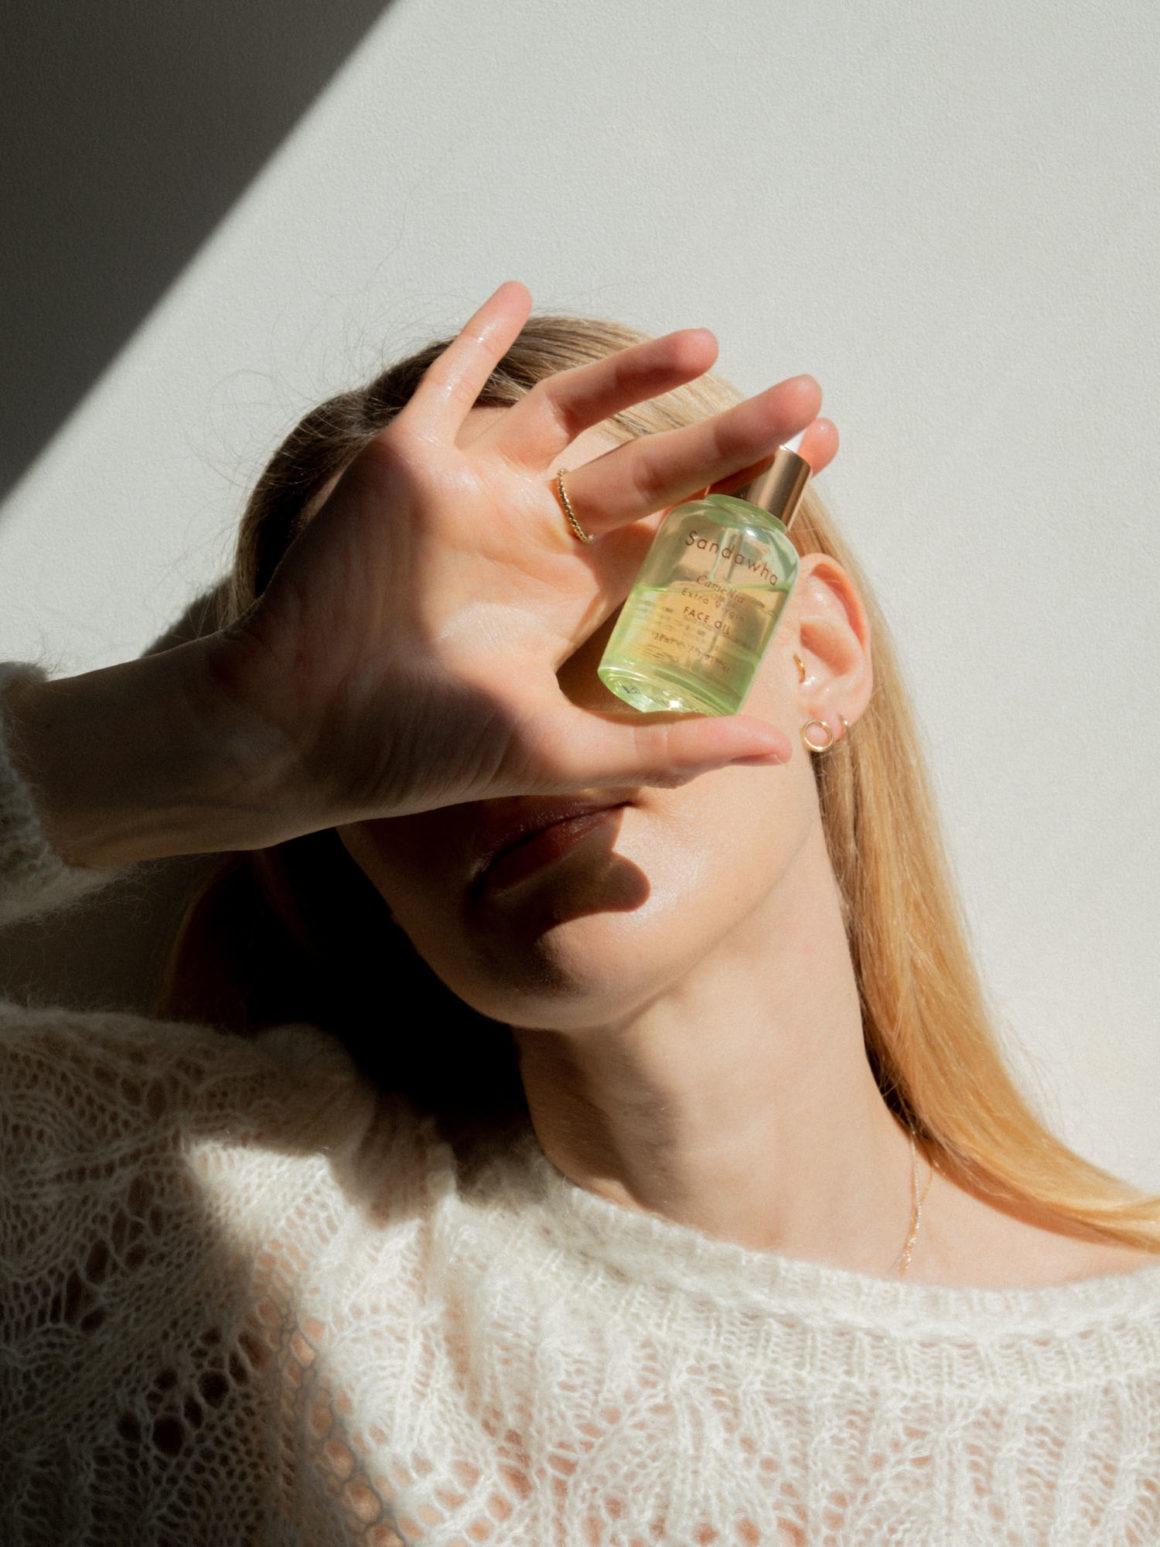 Beautyblog Bare Minds Sandawha Öl für sensible Haut5